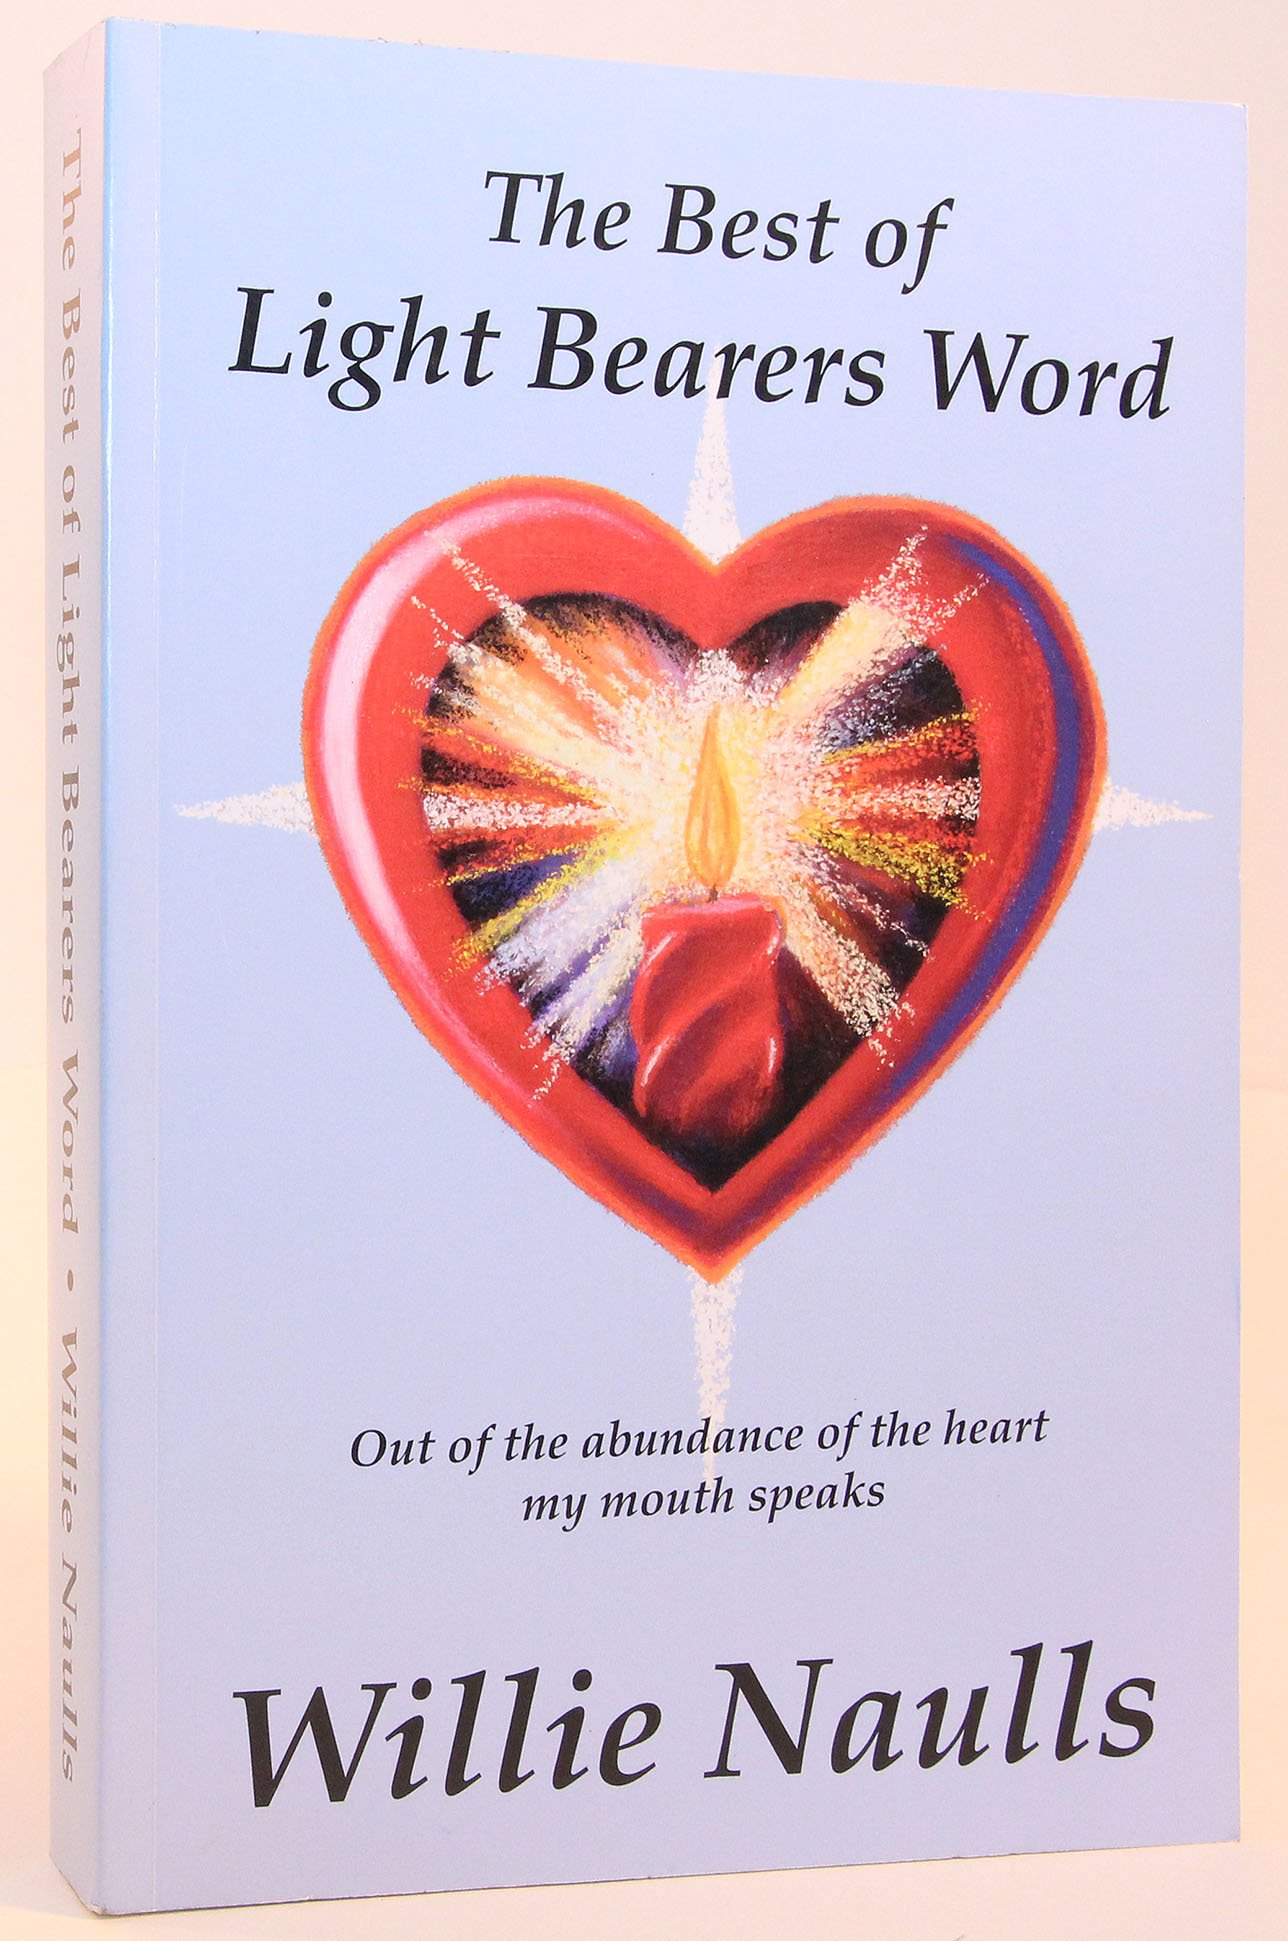 The Best of of Light Bearers Word Willie Naulls